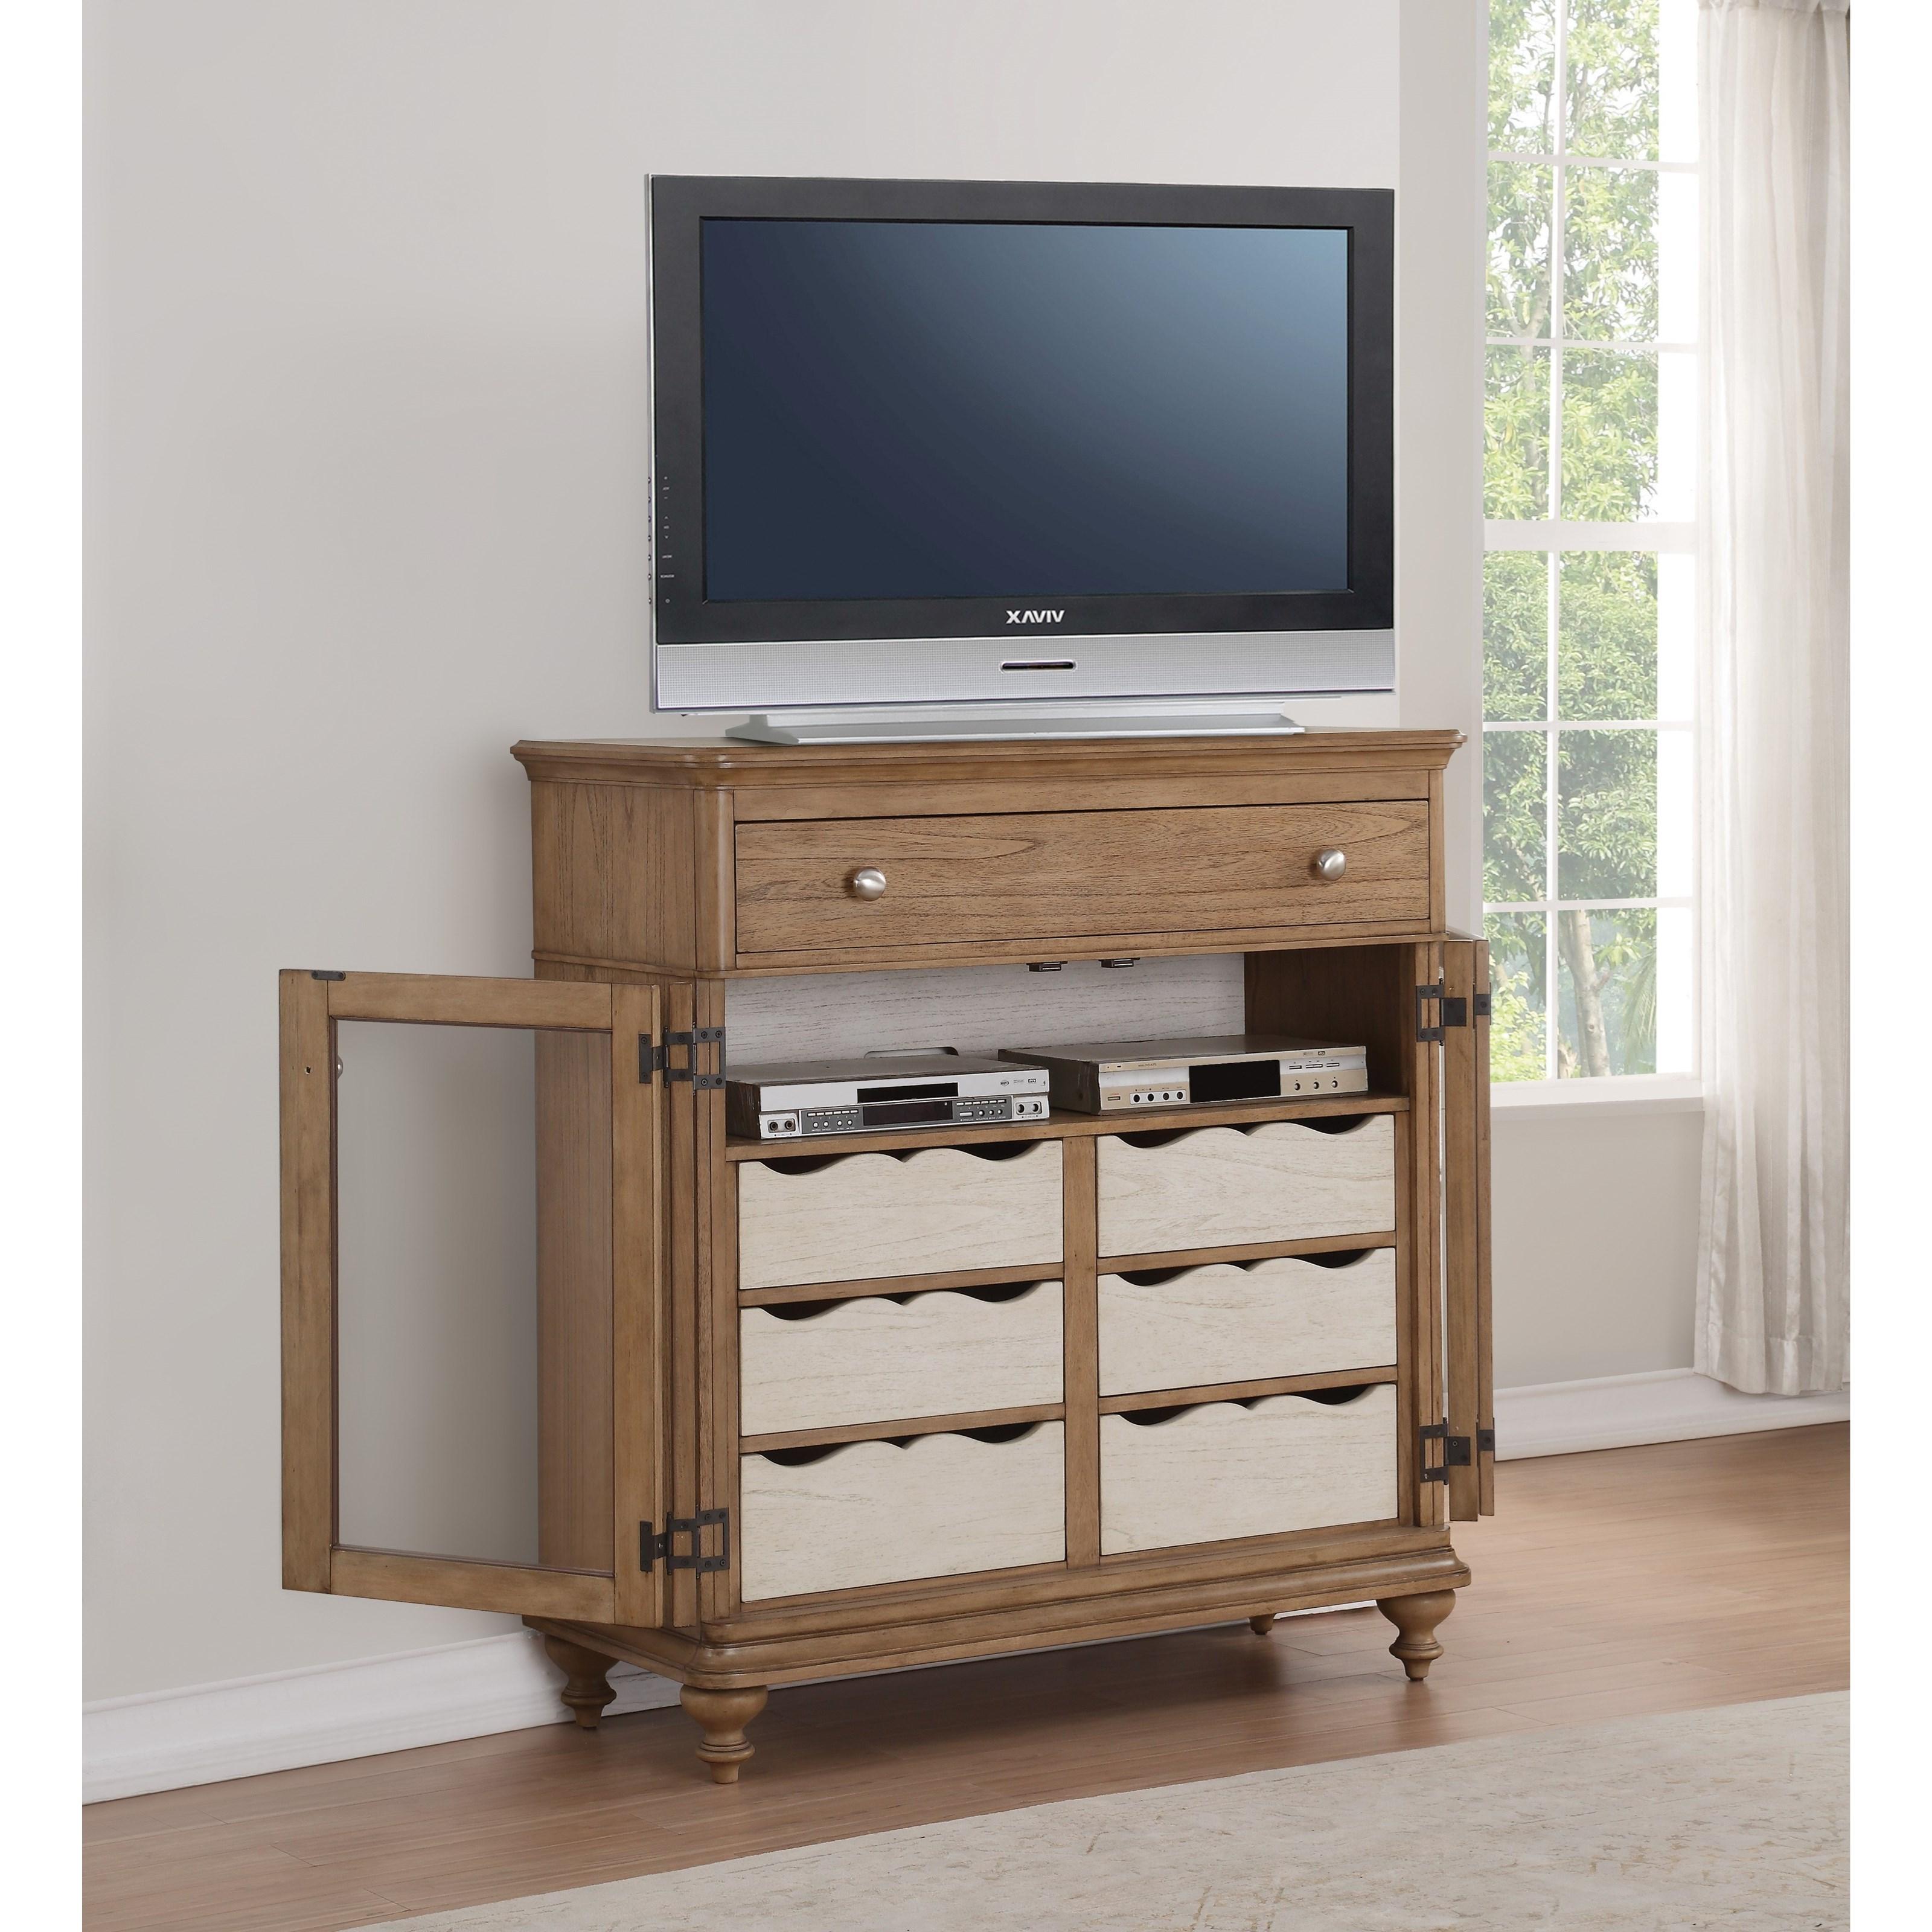 flexsteel wynwood collection cordoba media chest with open flexsteel wynwood collection miramar w1049 866 11981